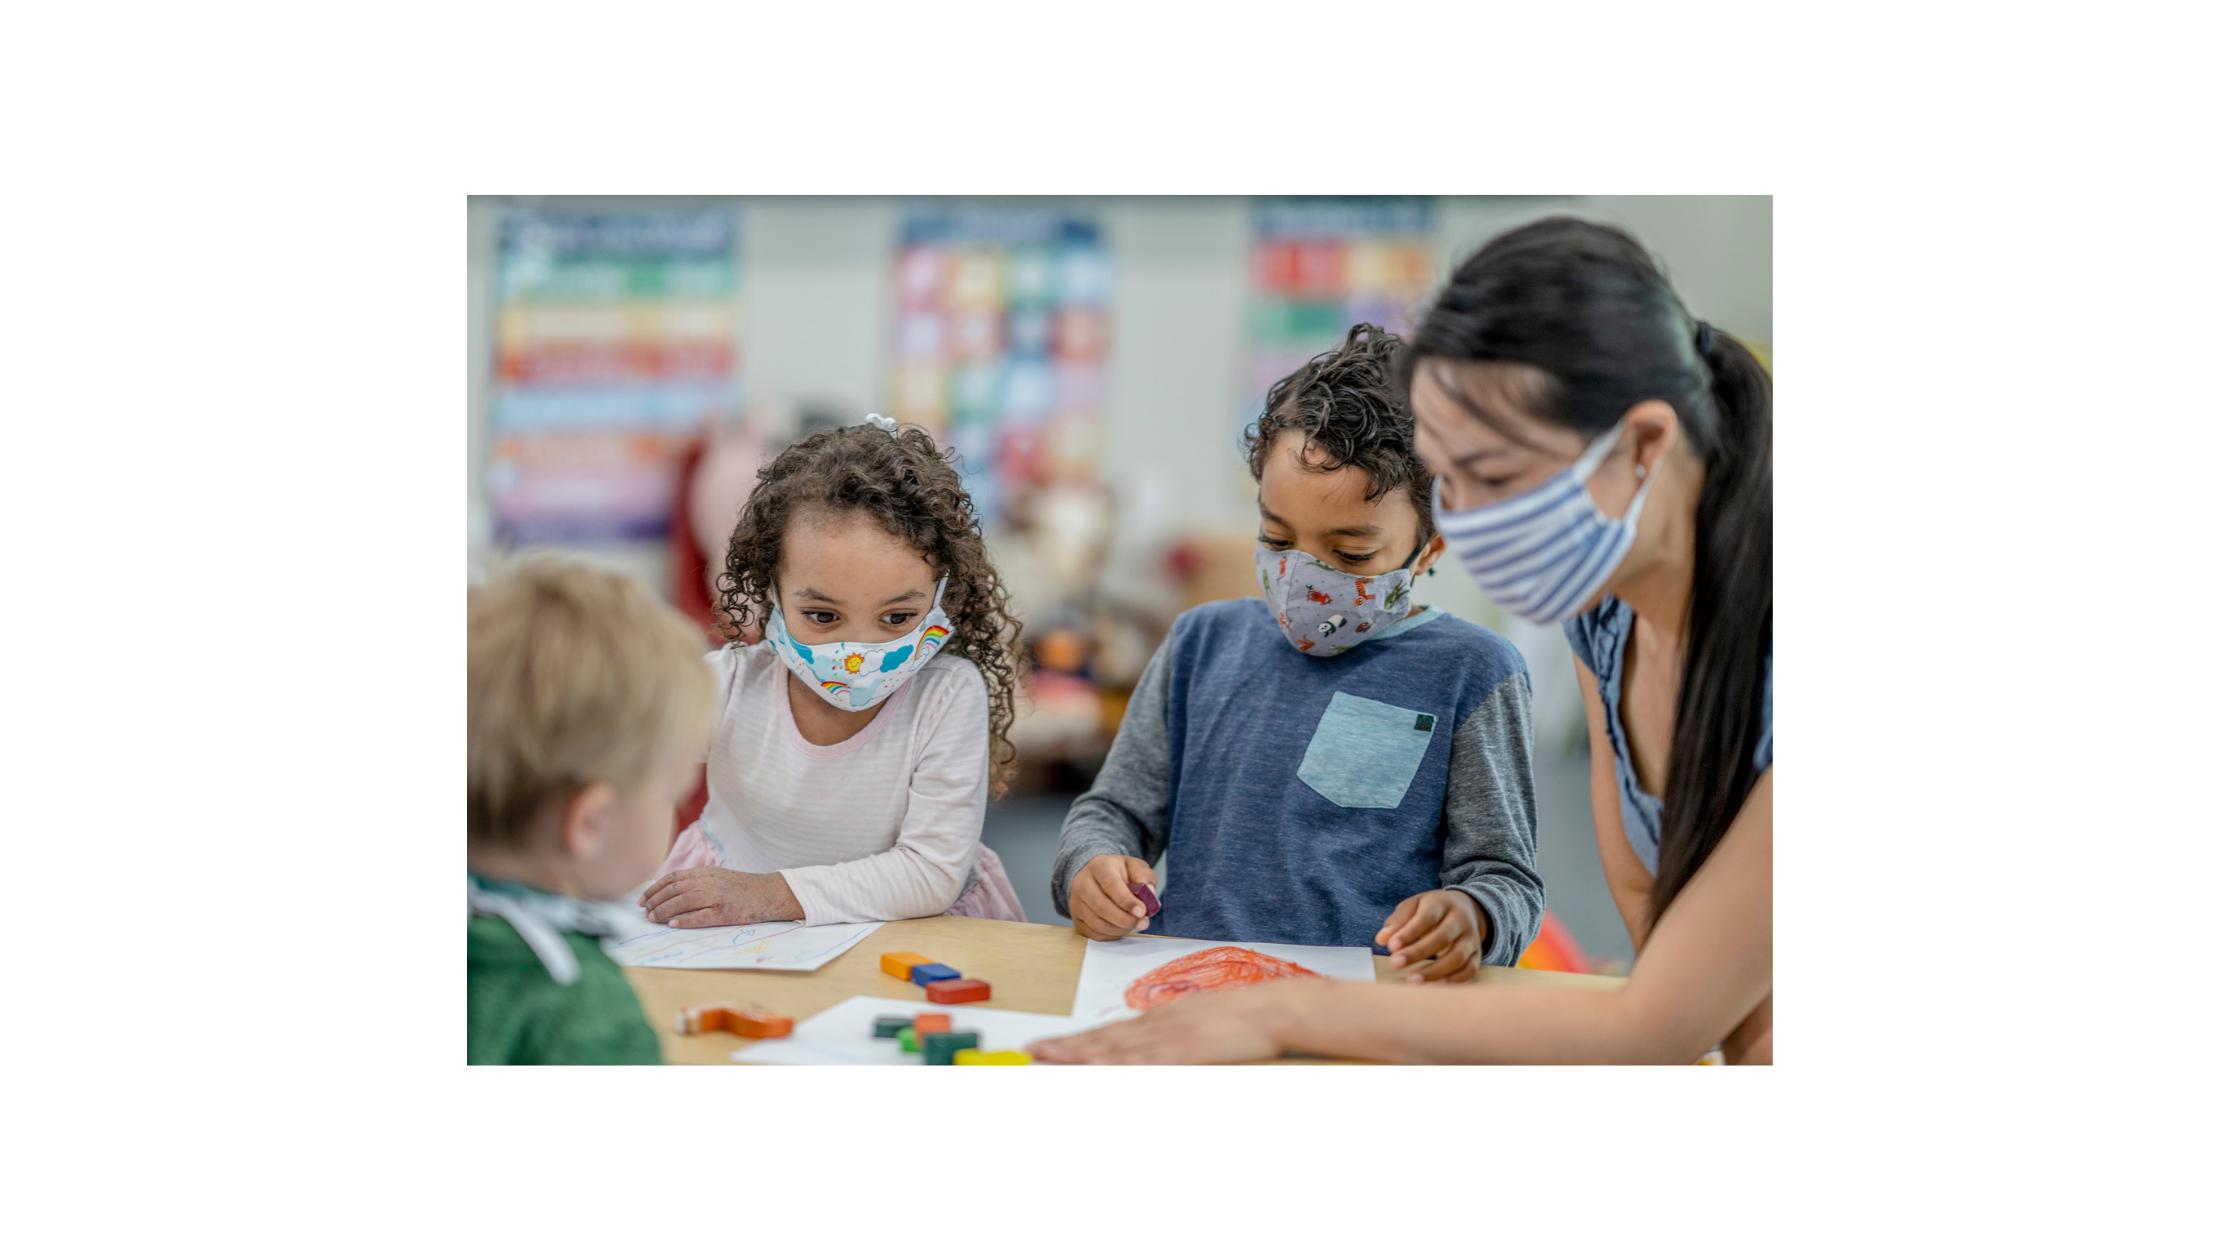 Four Lee County teachers receive $2,500 grants for innovative teaching ideas